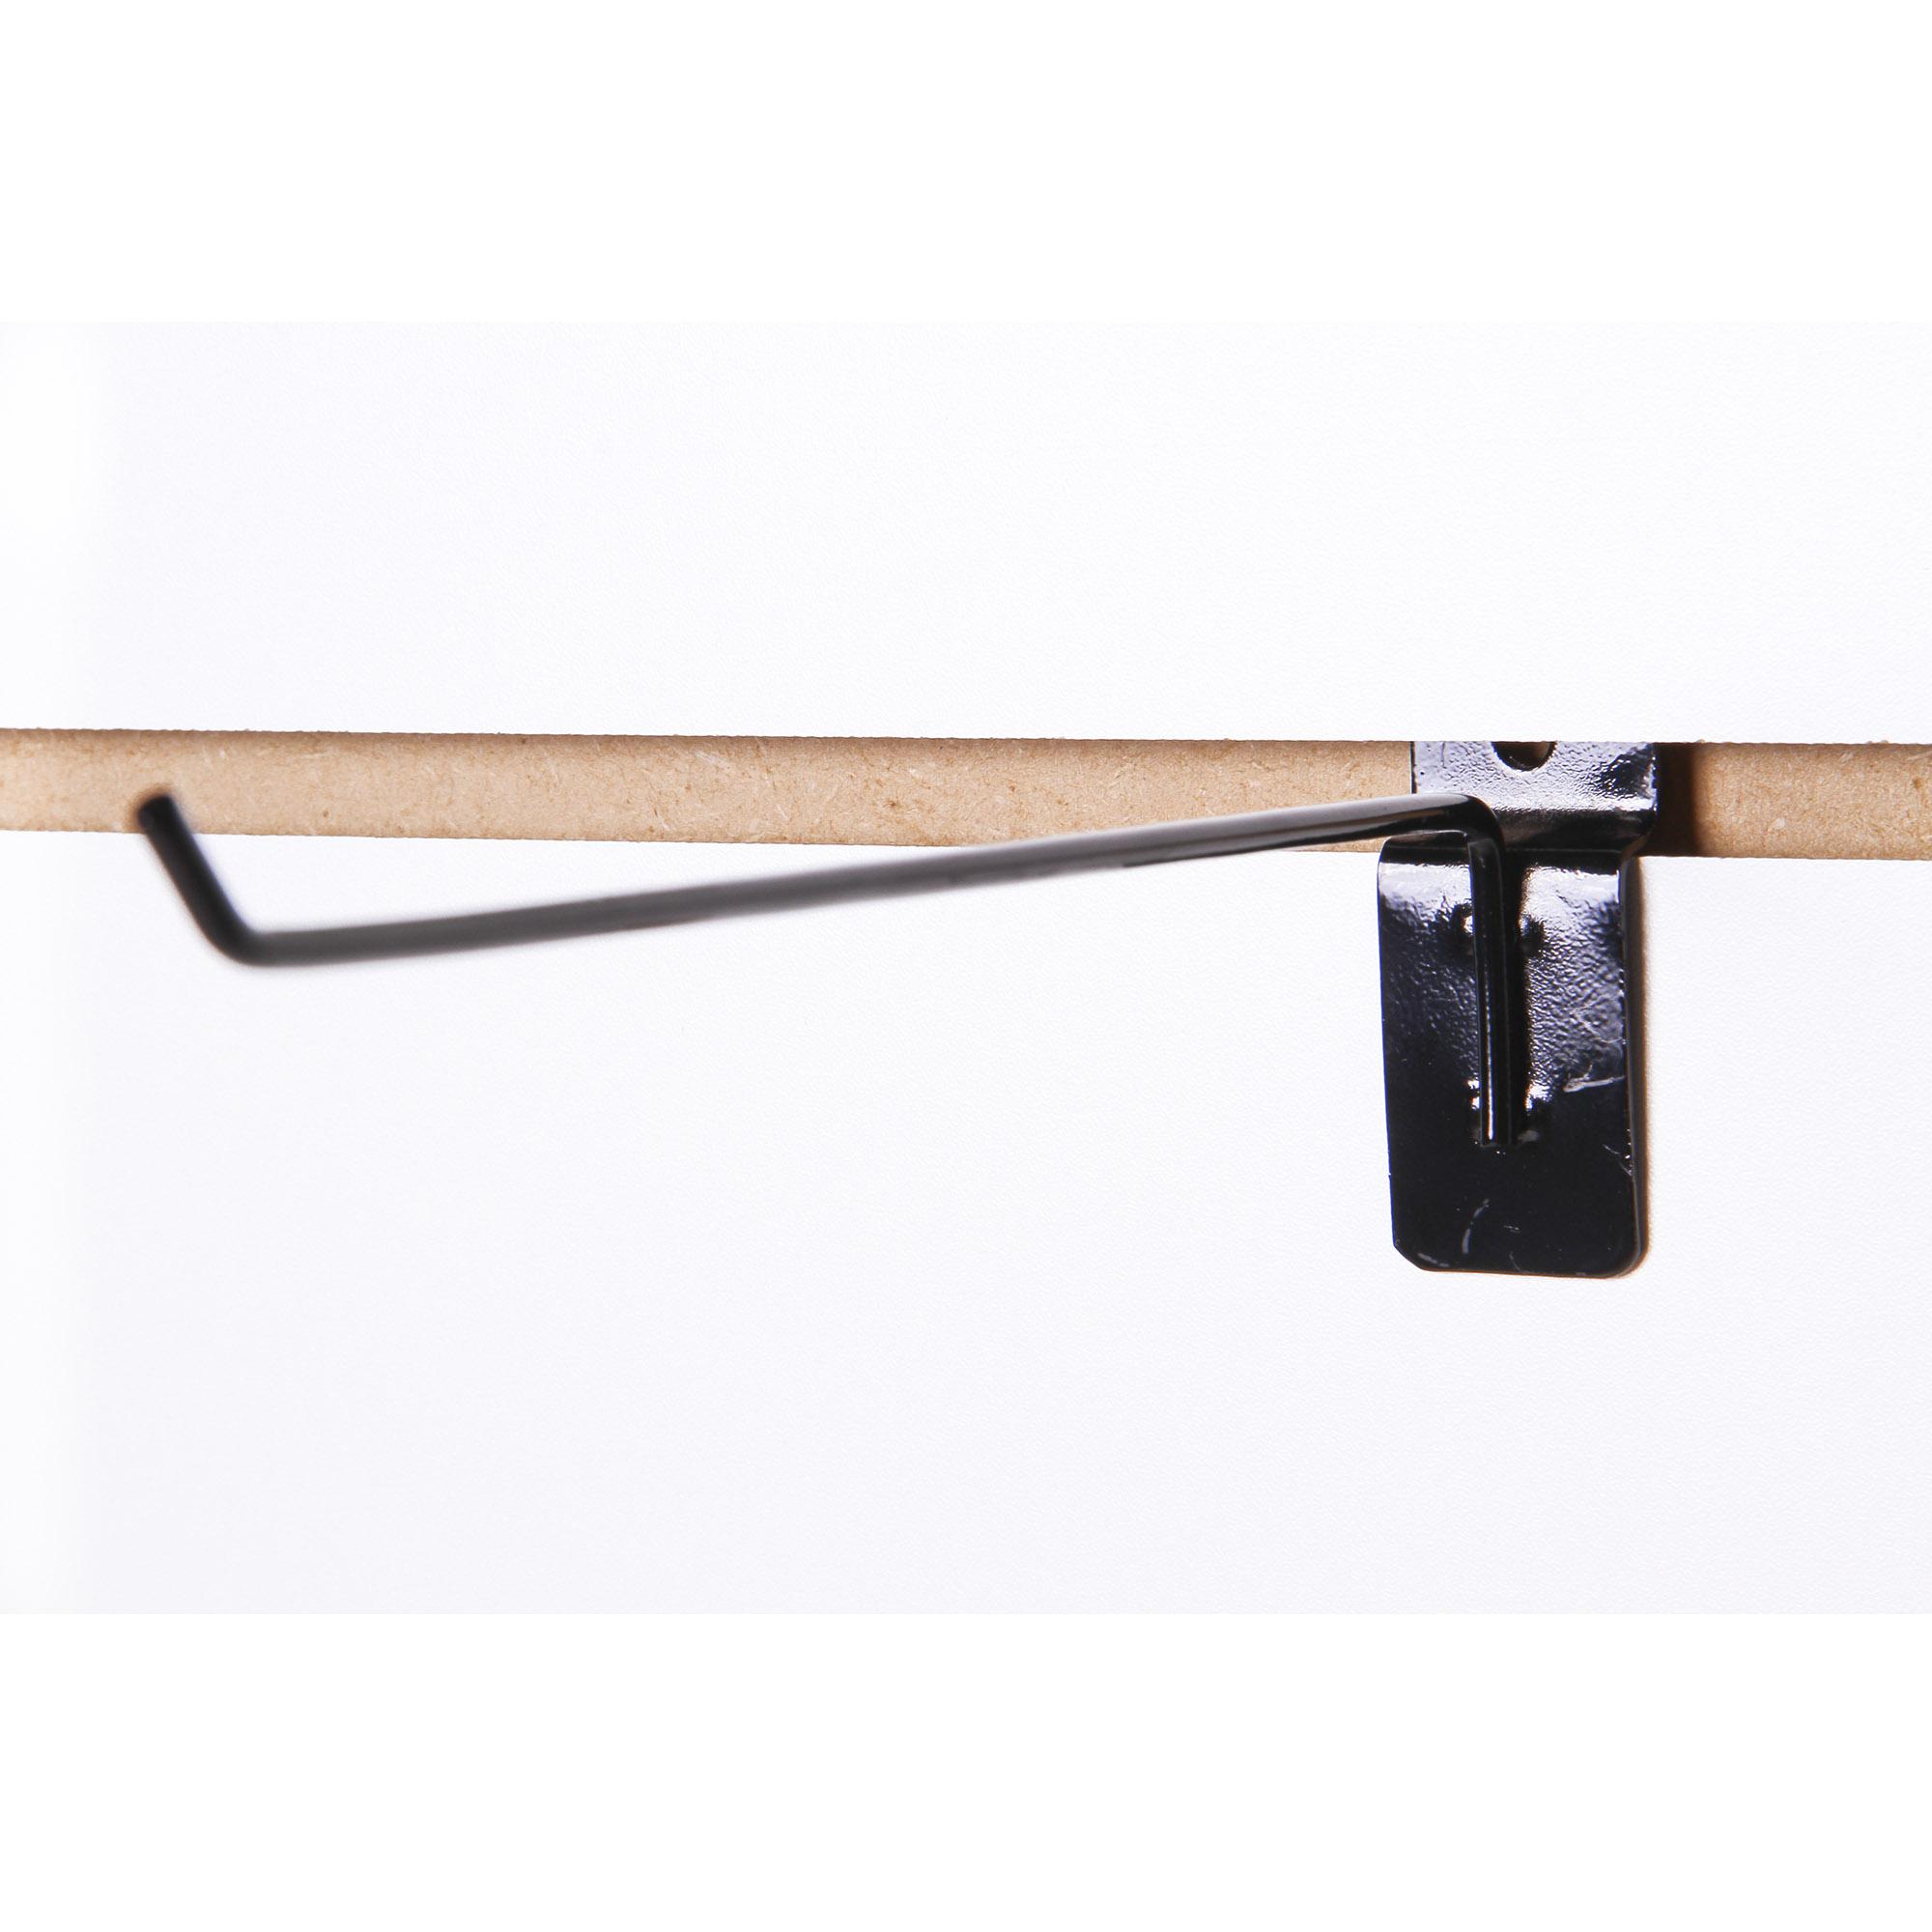 Kit Gancho Painel Canaletado 10cm - 50 unidades